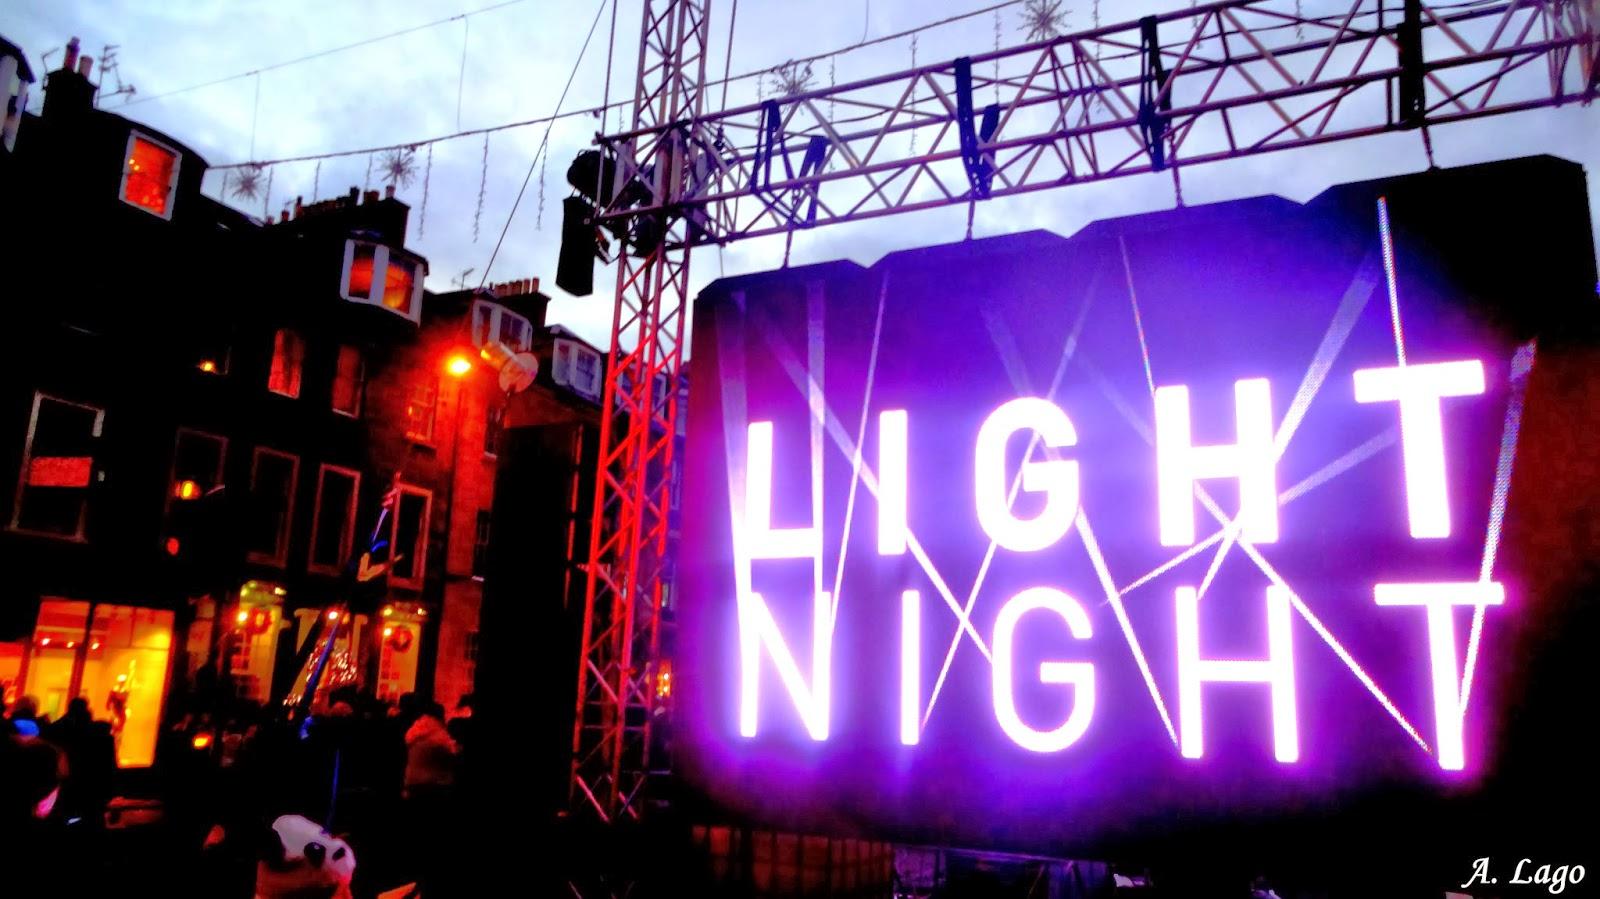 Living Edinburgh Light Night